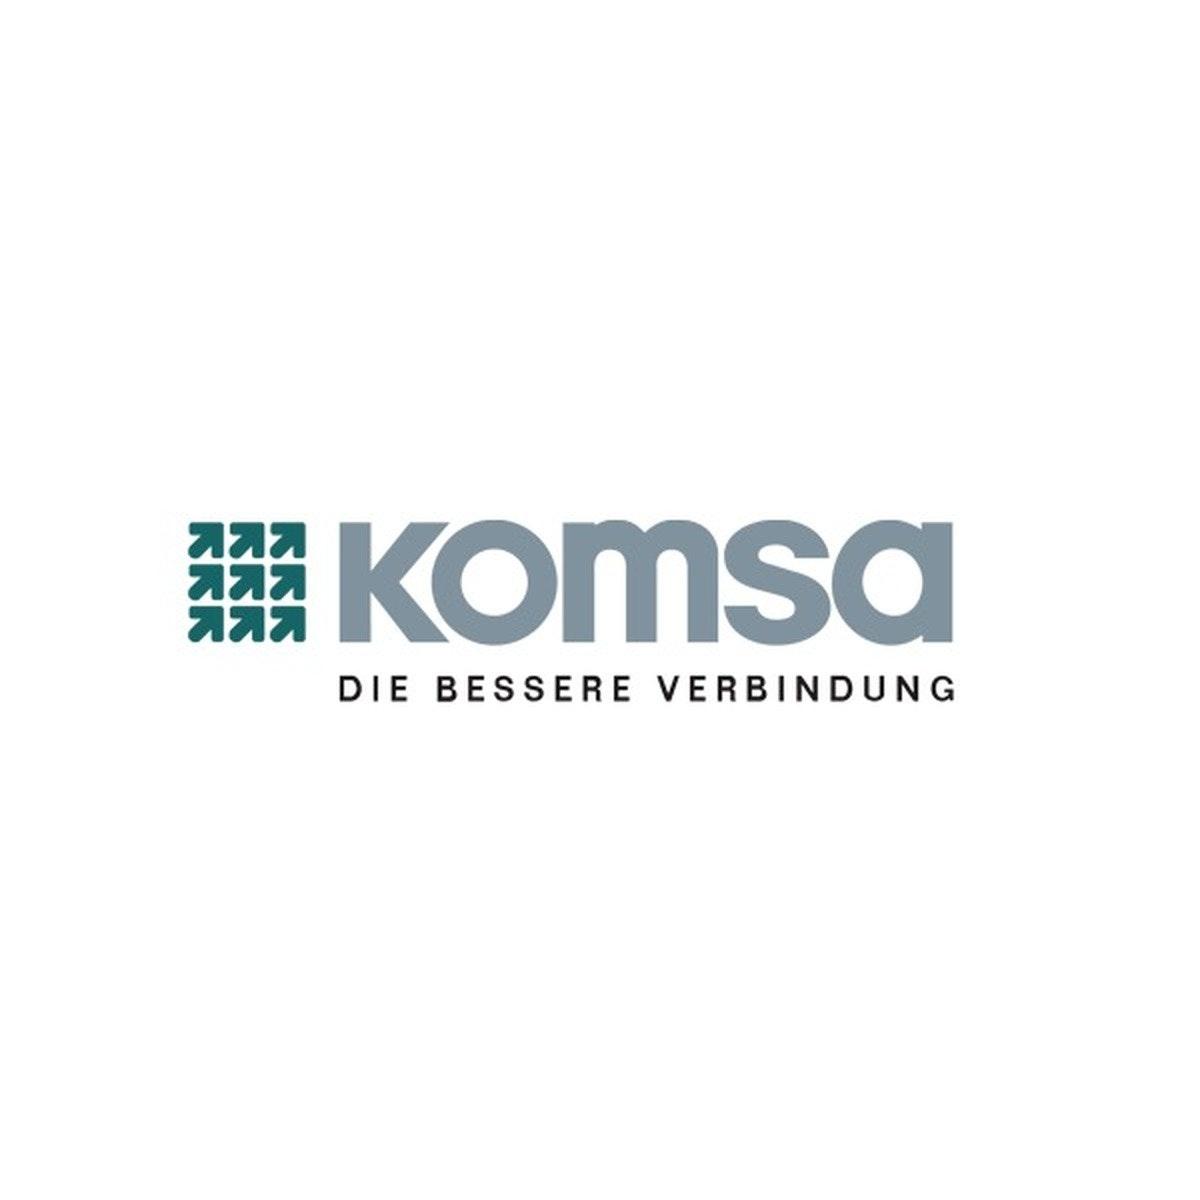 KOMSA Kommunikation Sachsen AG